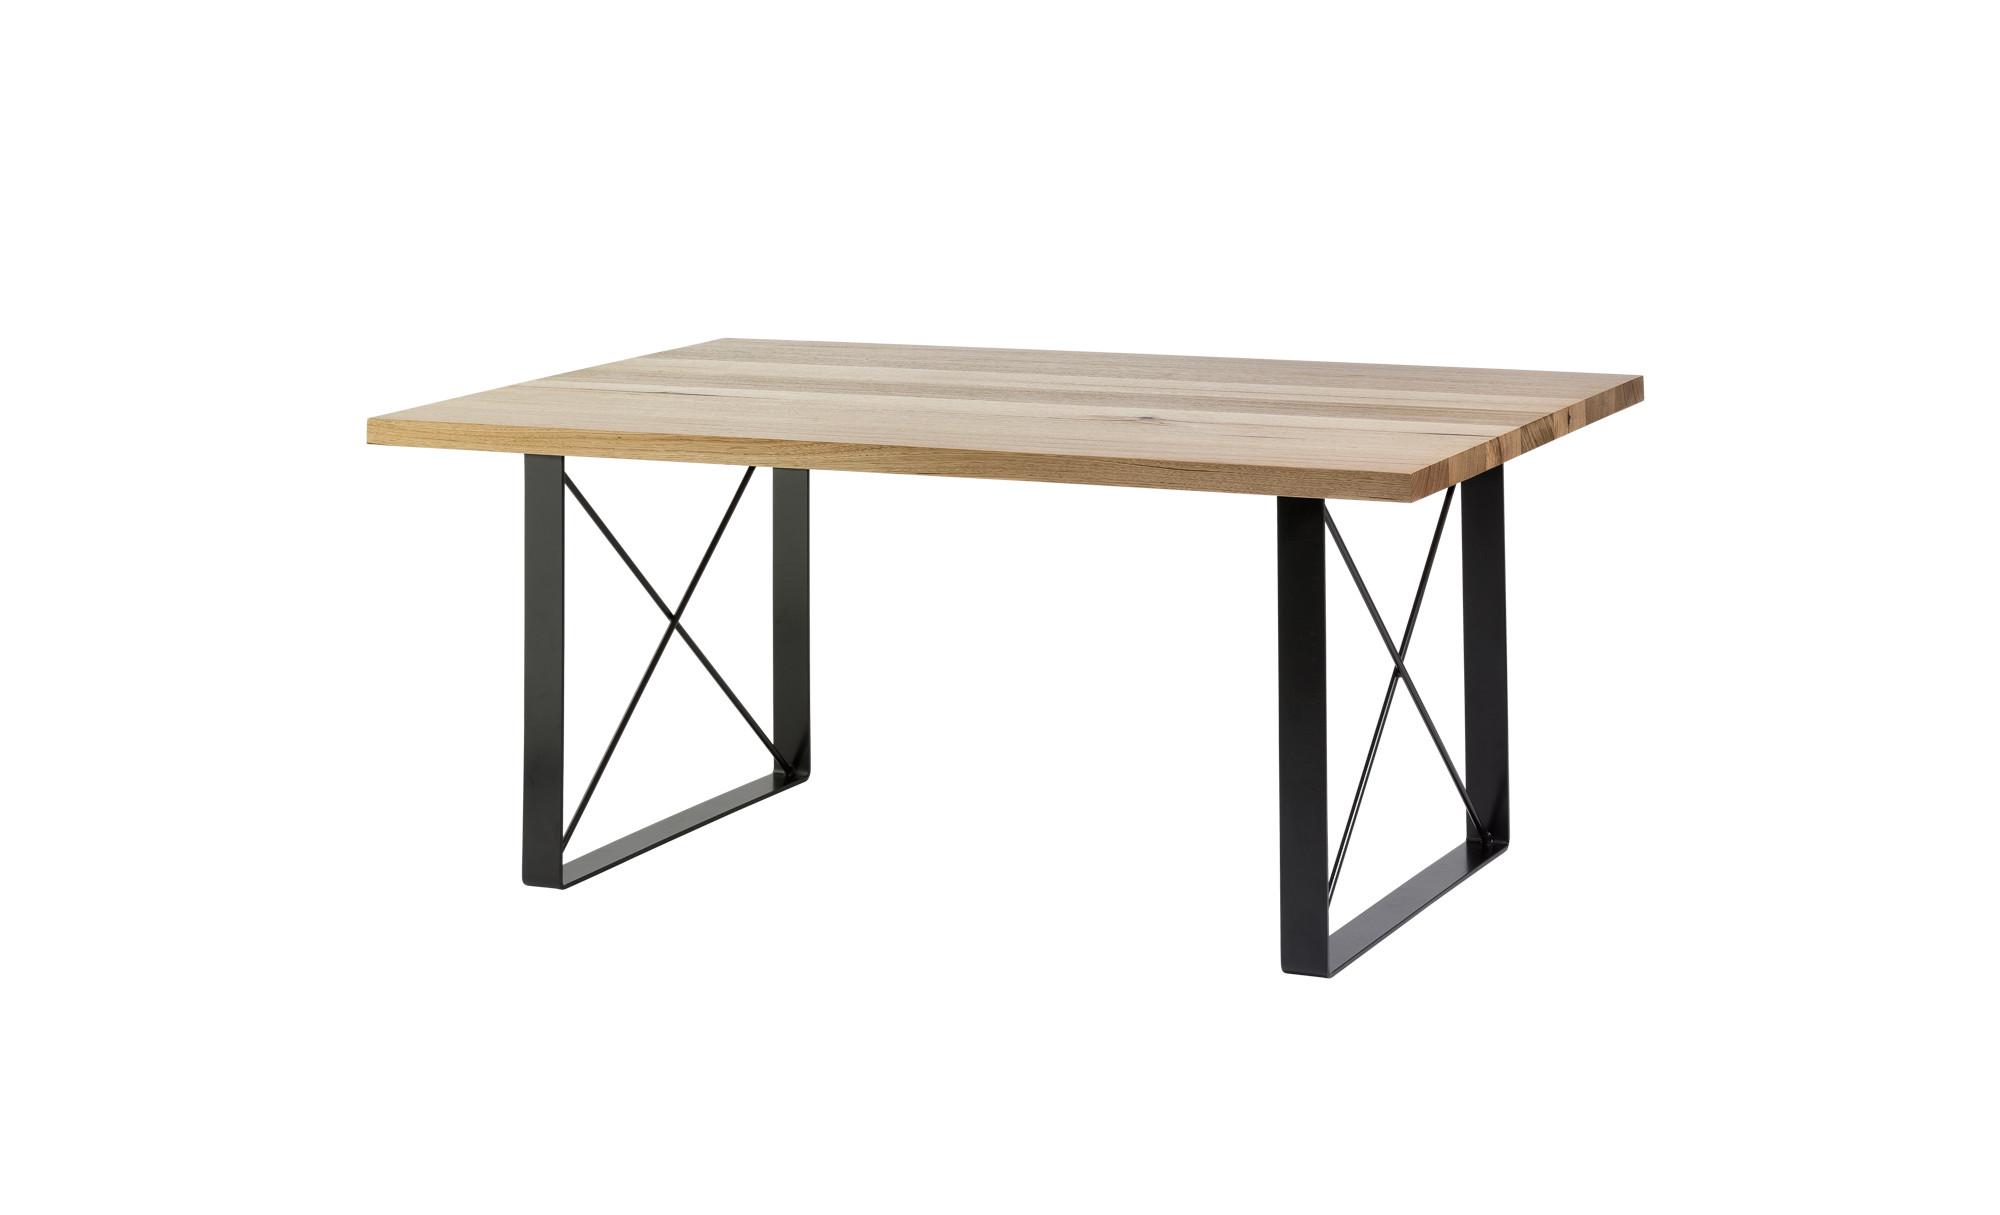 xframe table legs